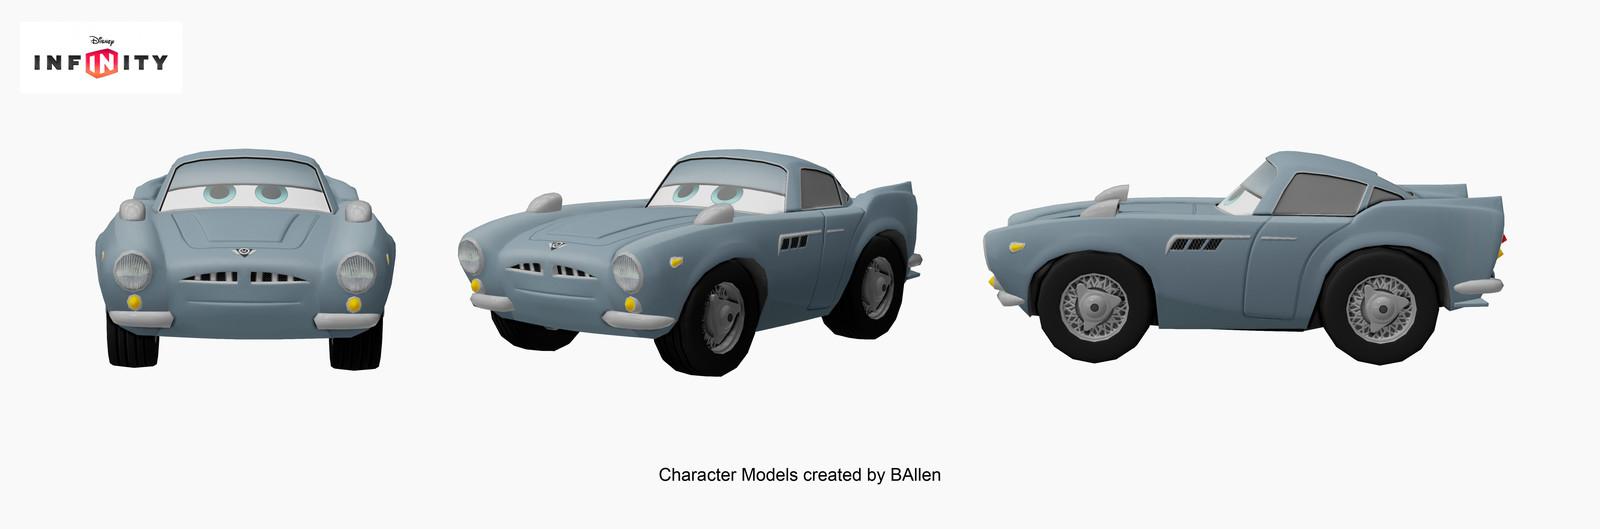 Finn McMissile character model by BAllen